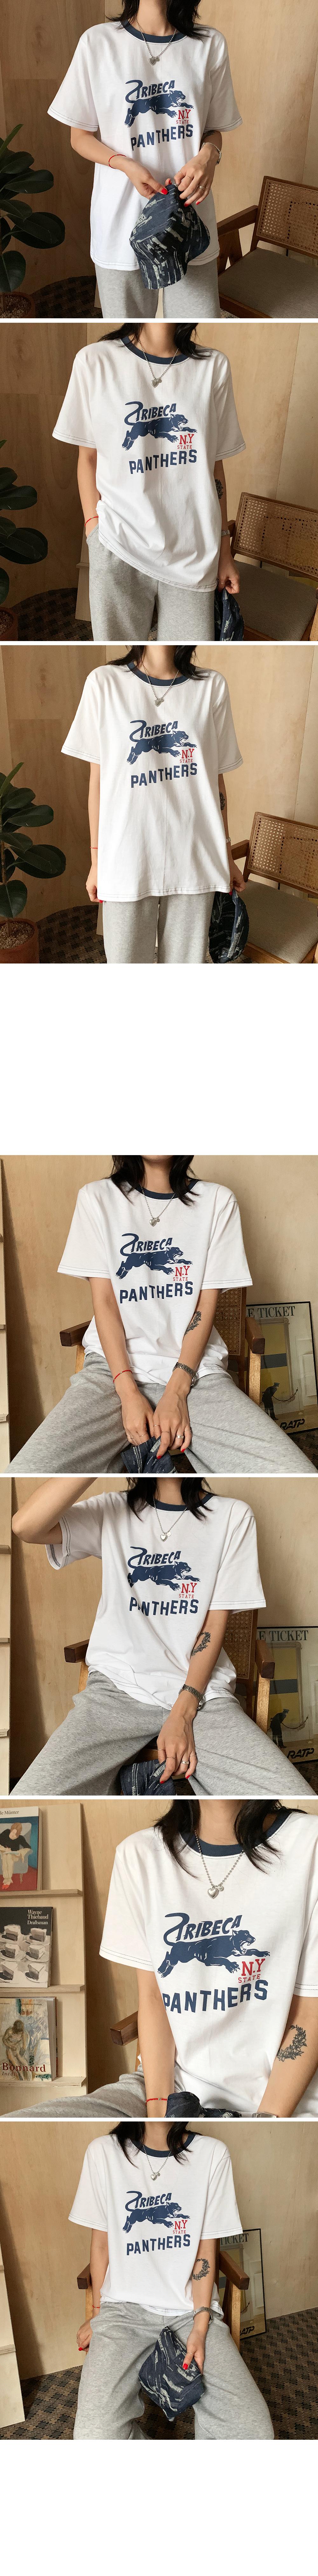 Panthers Printing Short Sleeve Tee